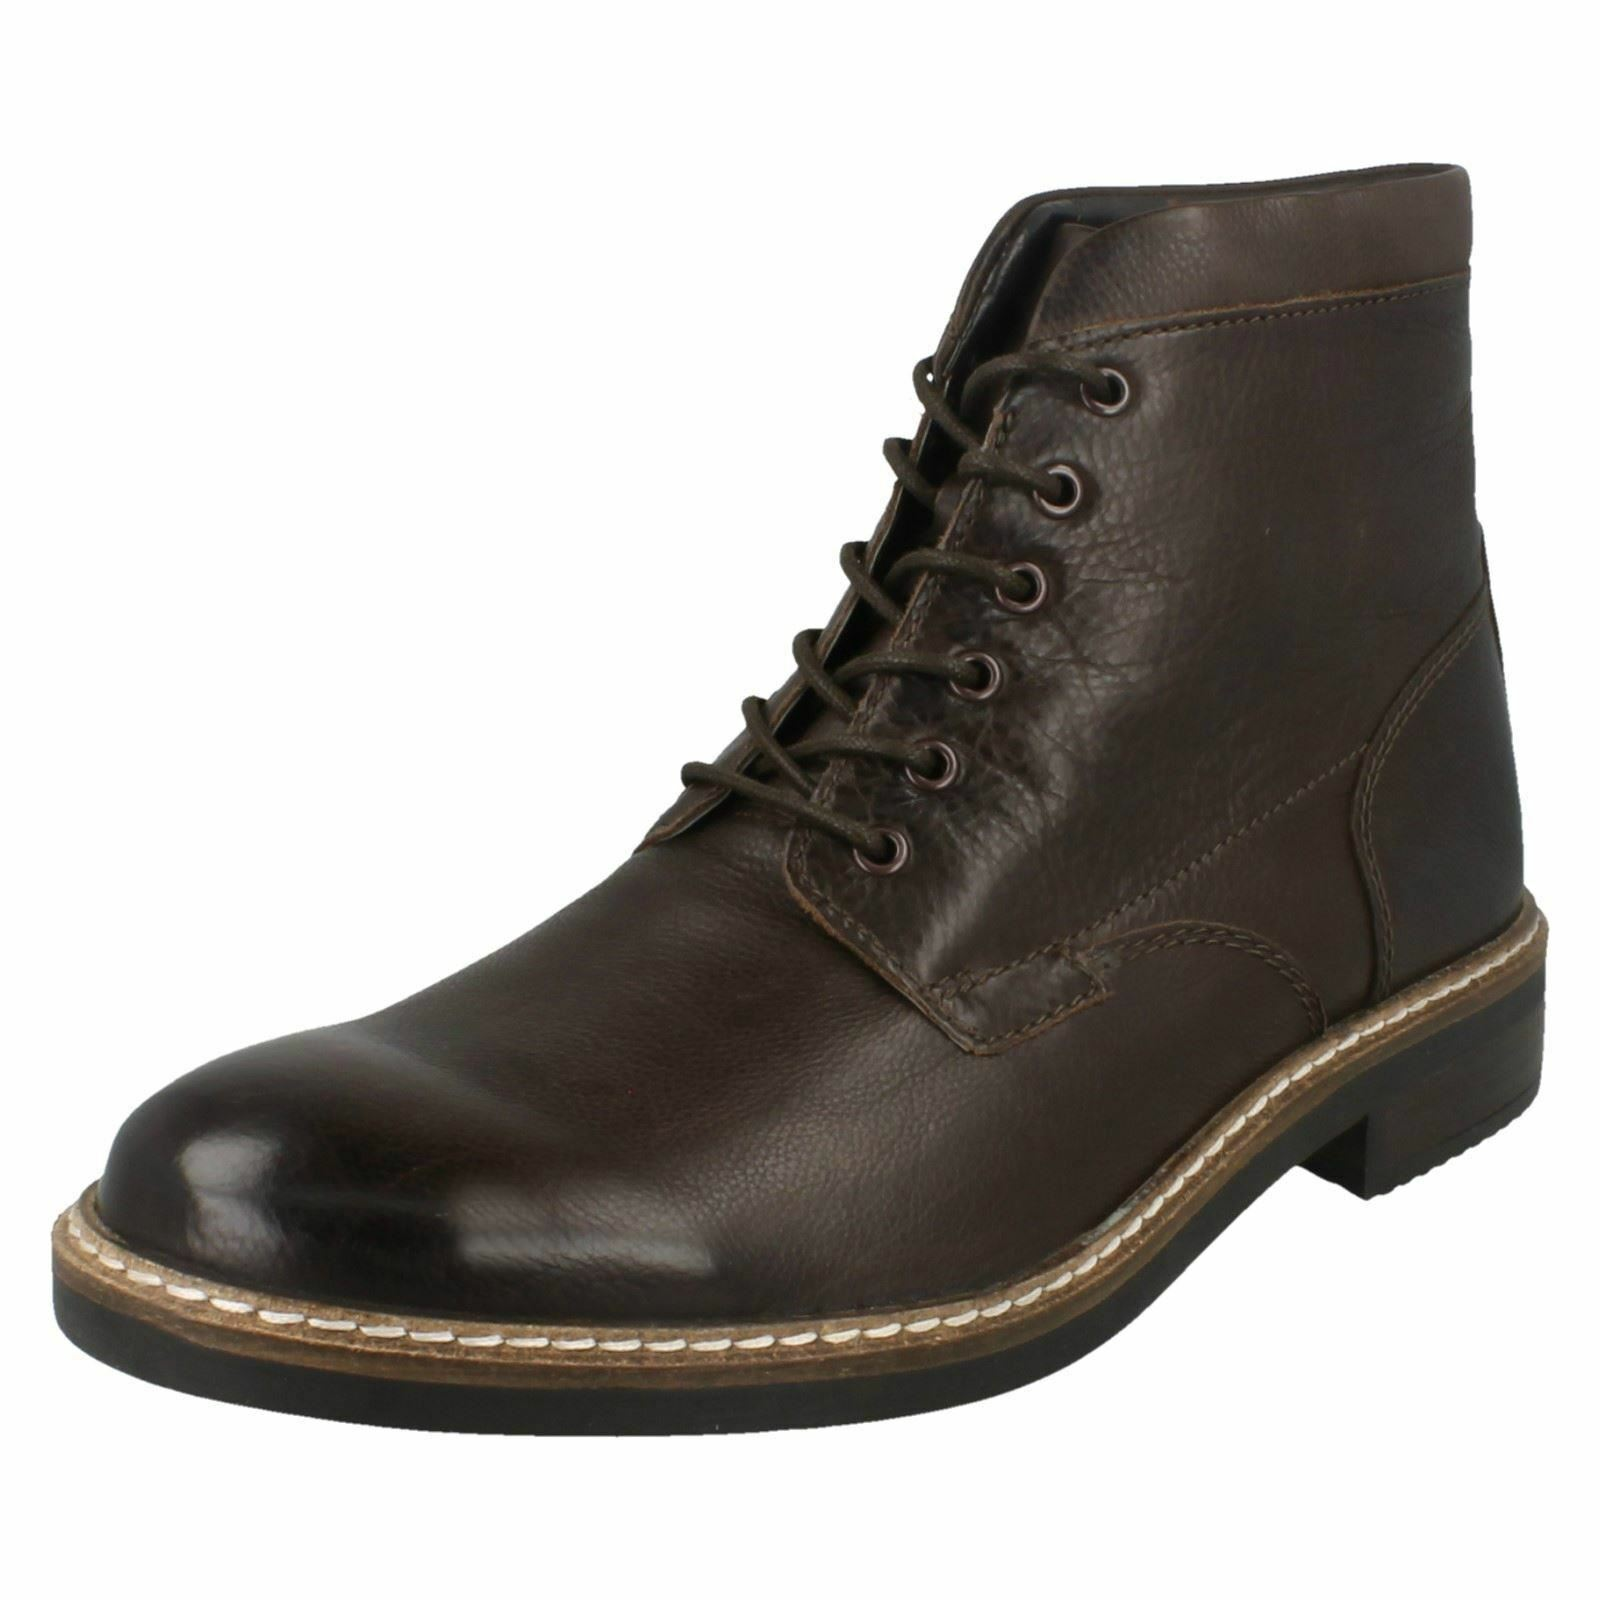 Mens Clarks Smart Ankle Boots 'Blackford Hi' size 8&8.5